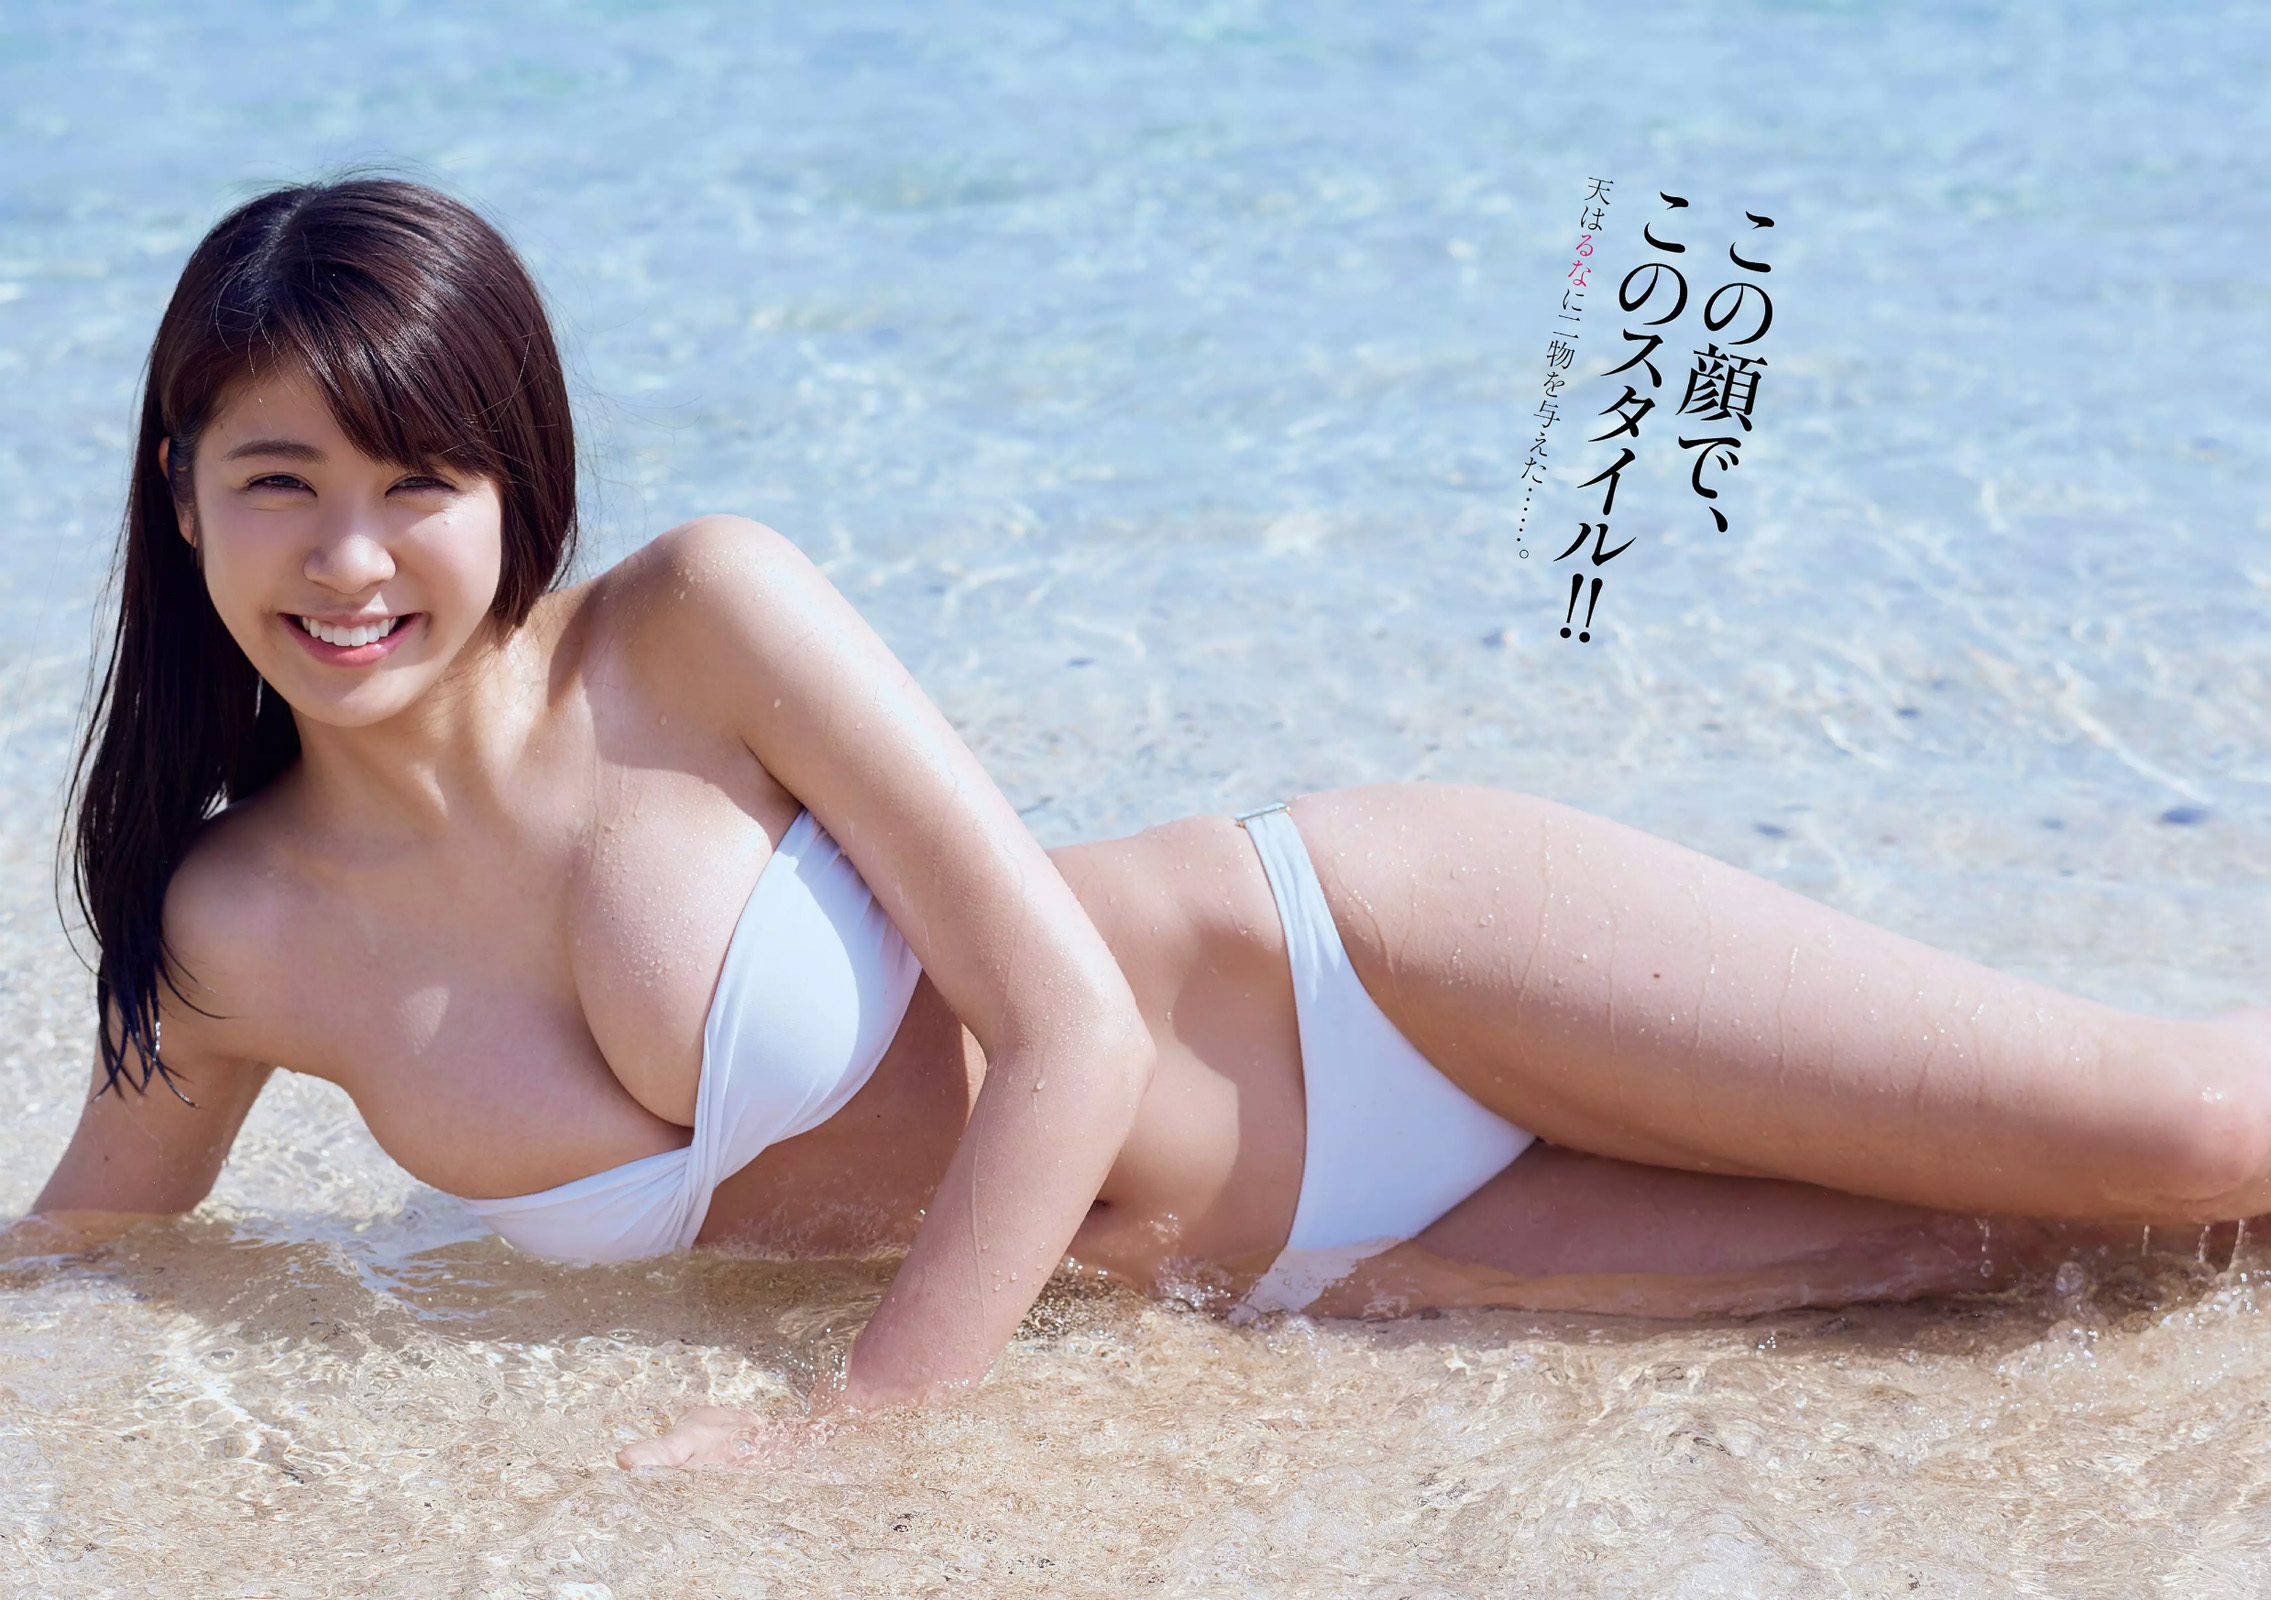 [Weekly Playboy] 2017 No.22 Fumika Baba & Chika Yamane & Yurina Yanagi & other